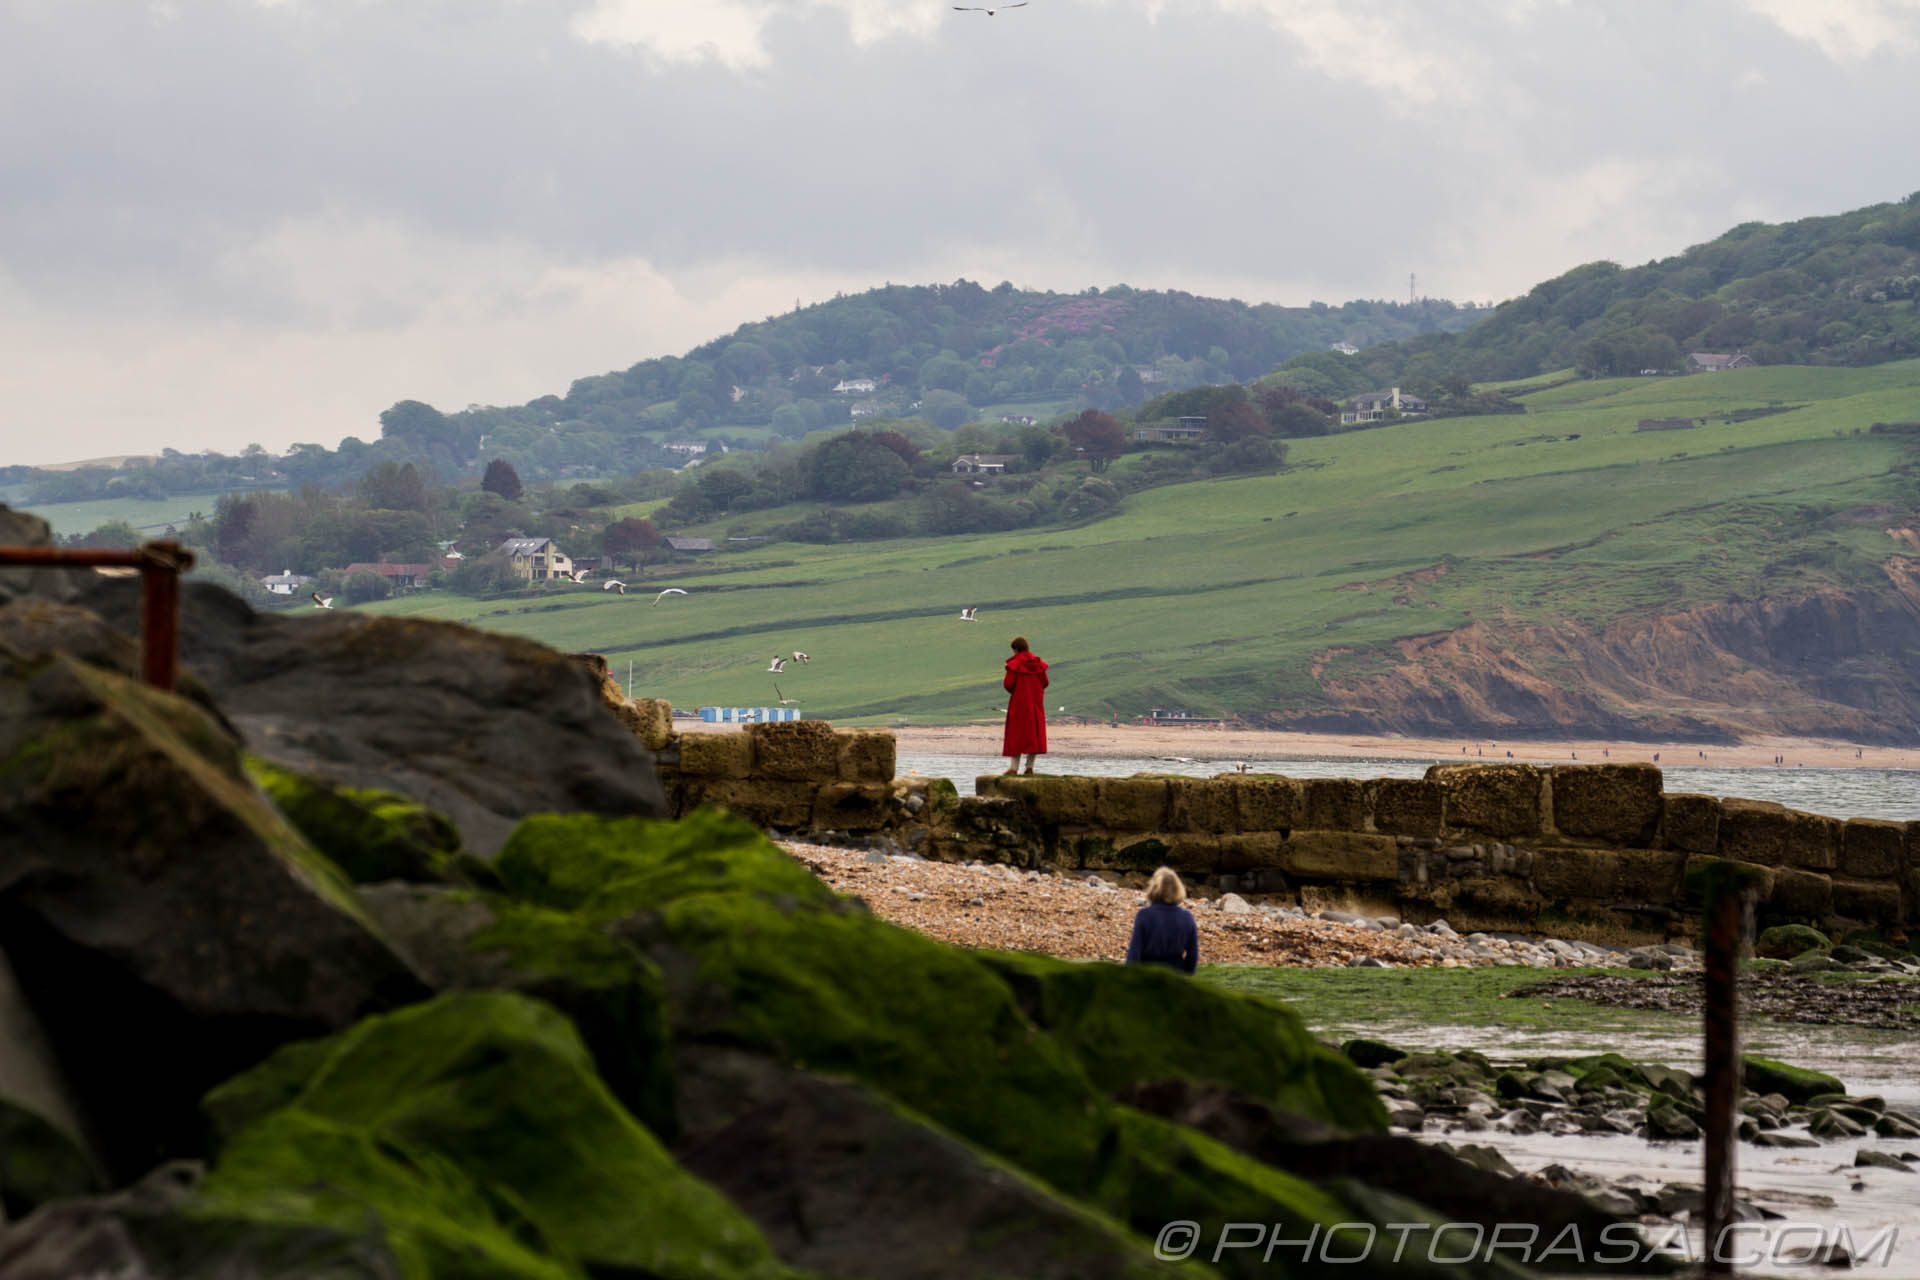 https://photorasa.com/jurassic-coast-lyme-regis/red-lady-by-the-rocks/